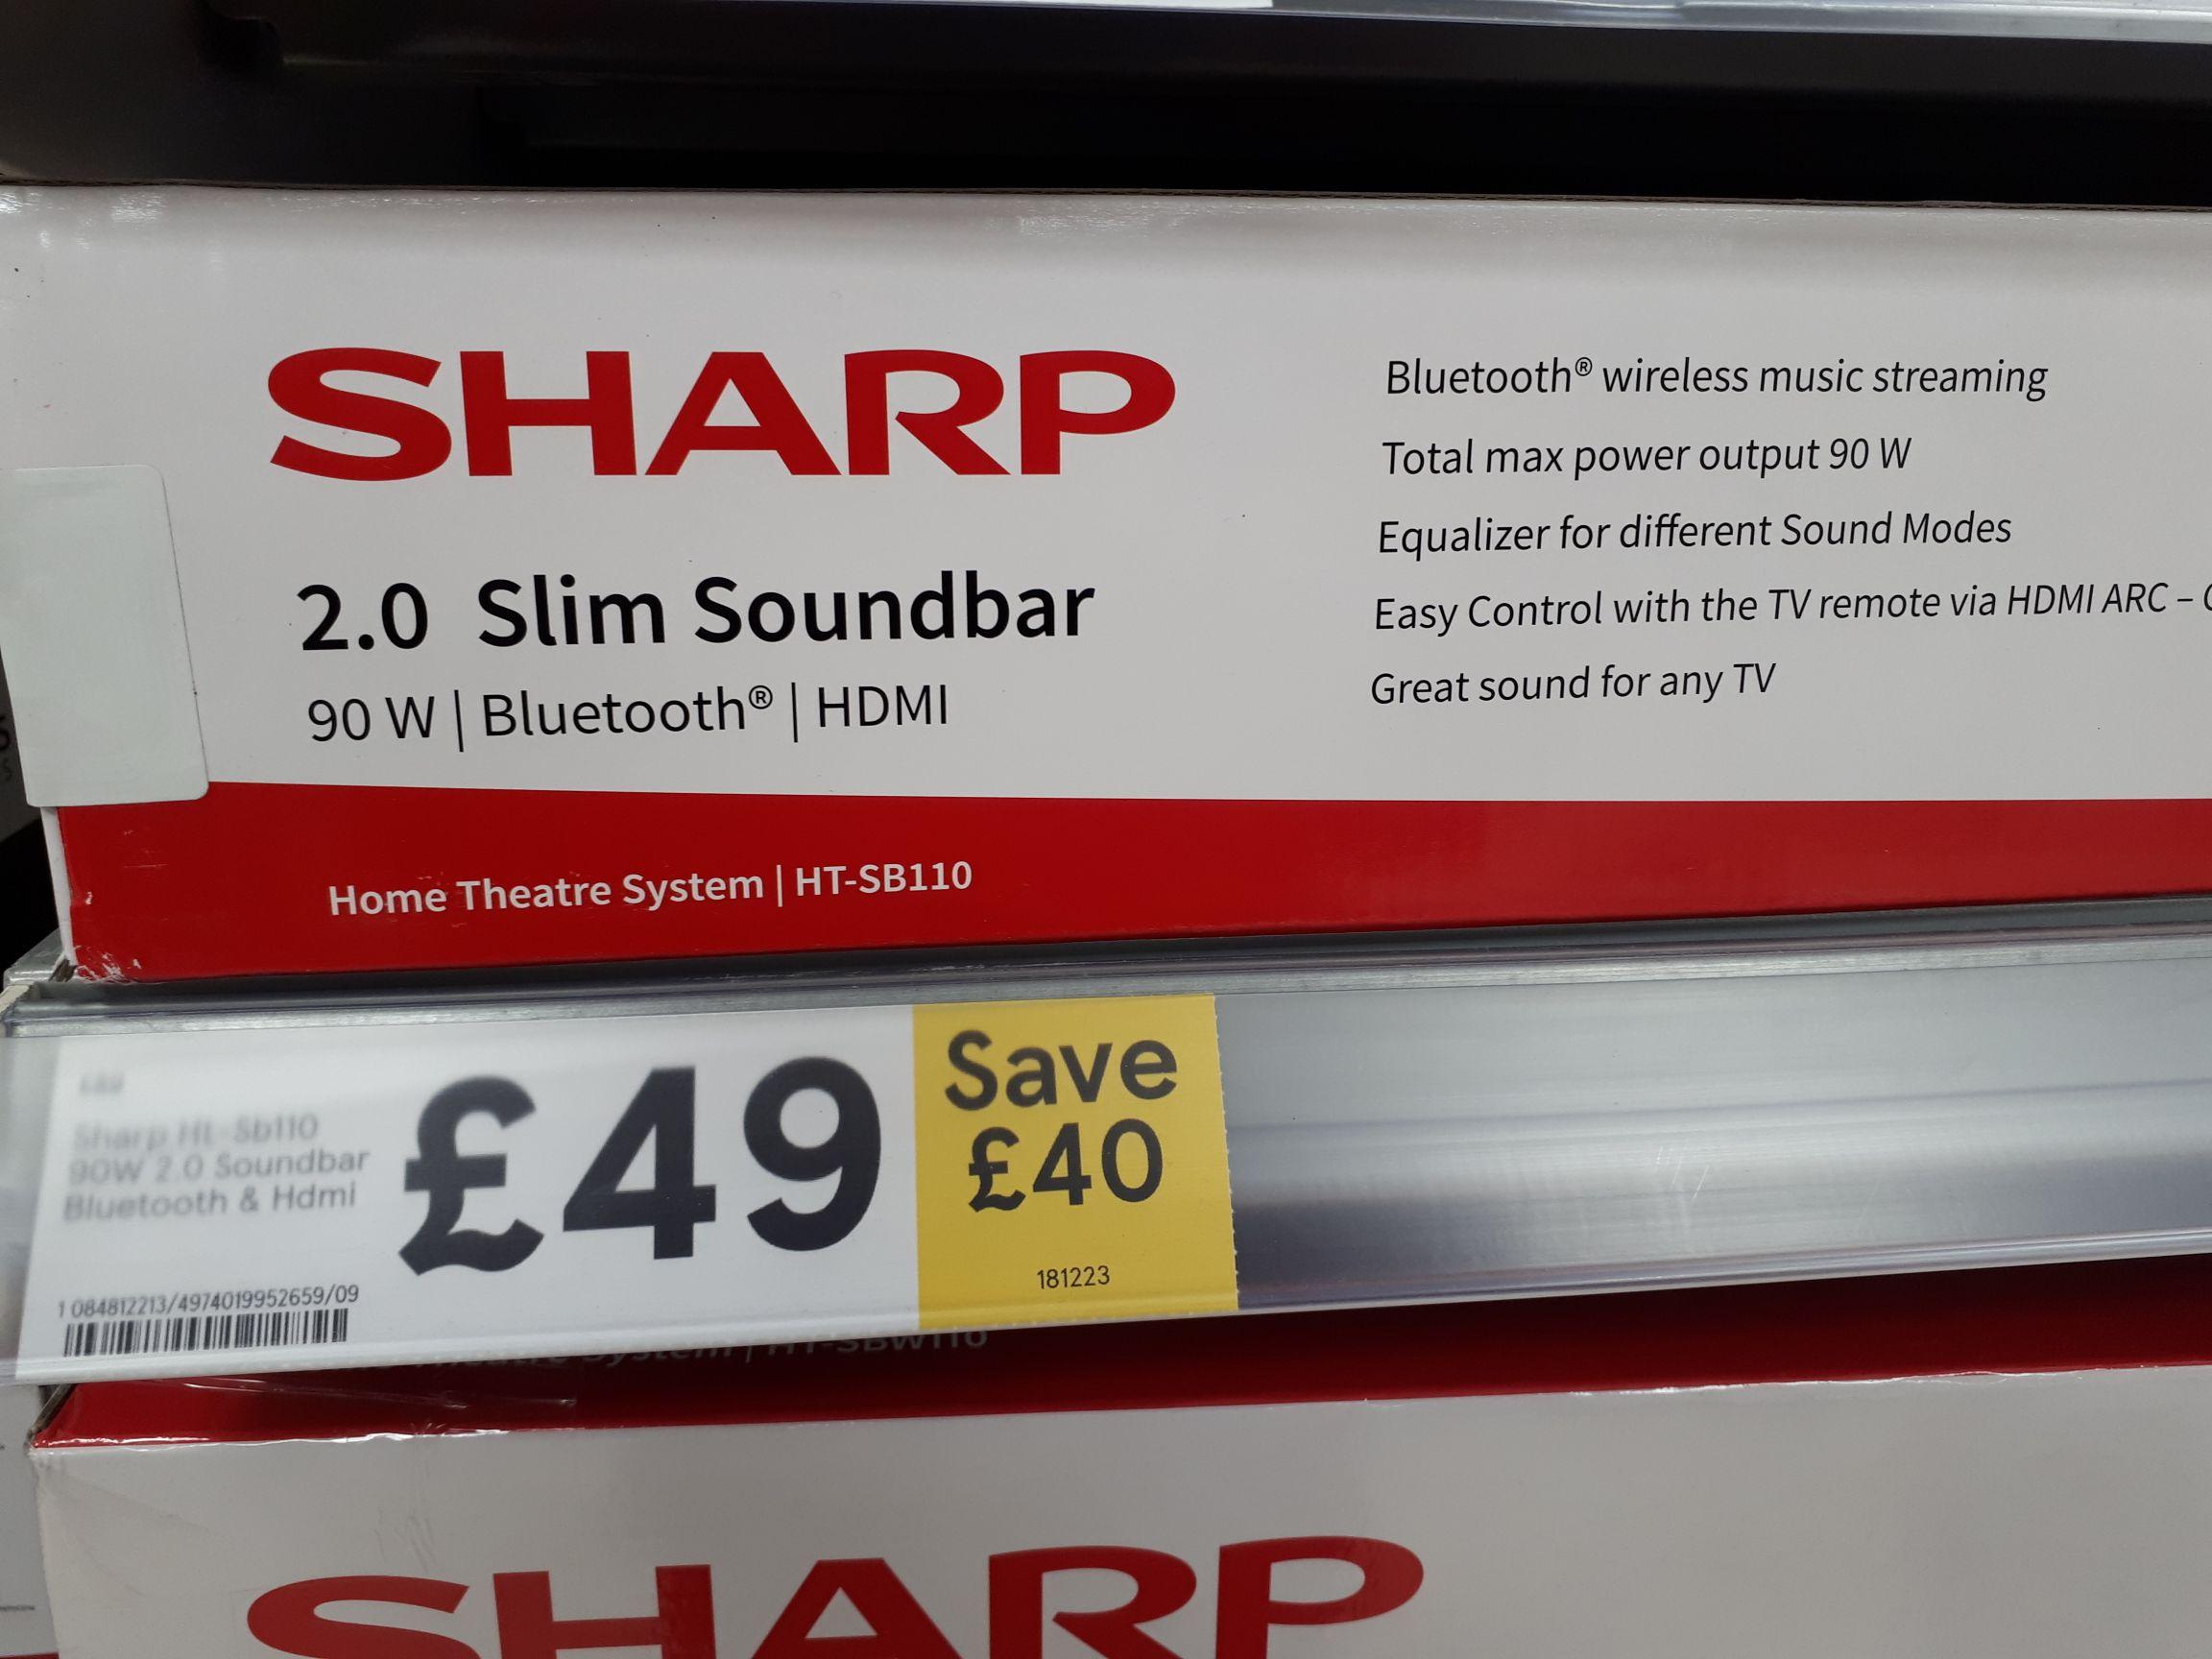 Sharp Ht-sb110 soundbar - Save £40! £49 instore @ Watford Tesco Express